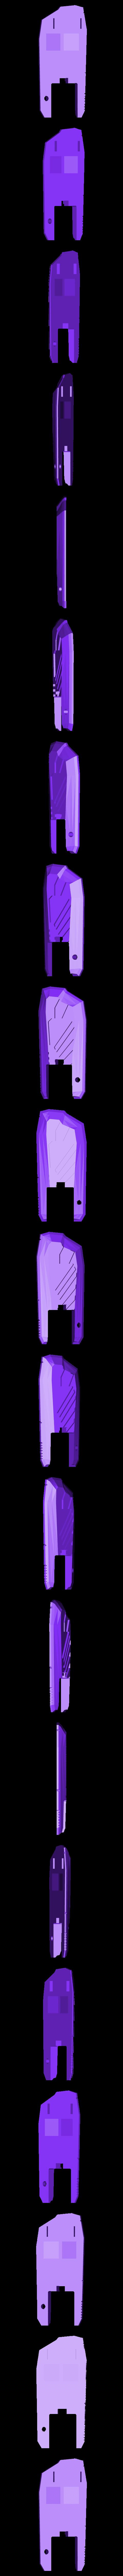 v05pt1corrected_back_L.stl Download free STL file TRANSFORMERS G1 CW Superion Thigs • 3D print model, sickofyou